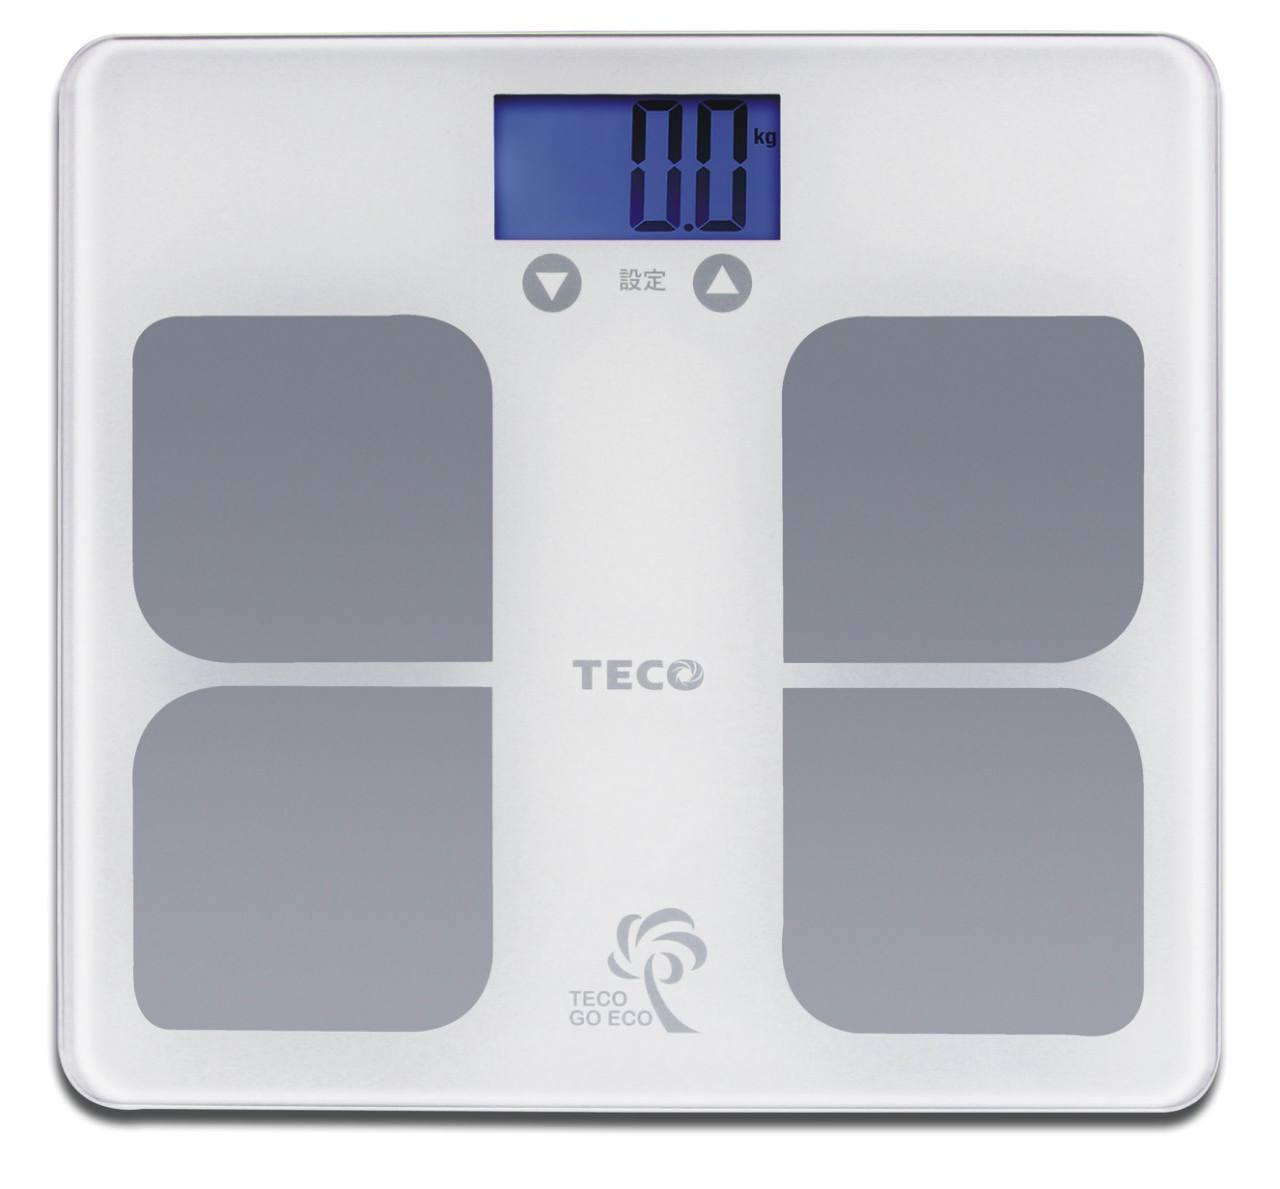 【SunEasy生活館】TECO東元BMI藍光體重計(XYFWT521)/強化玻璃/電子秤/人體秤/